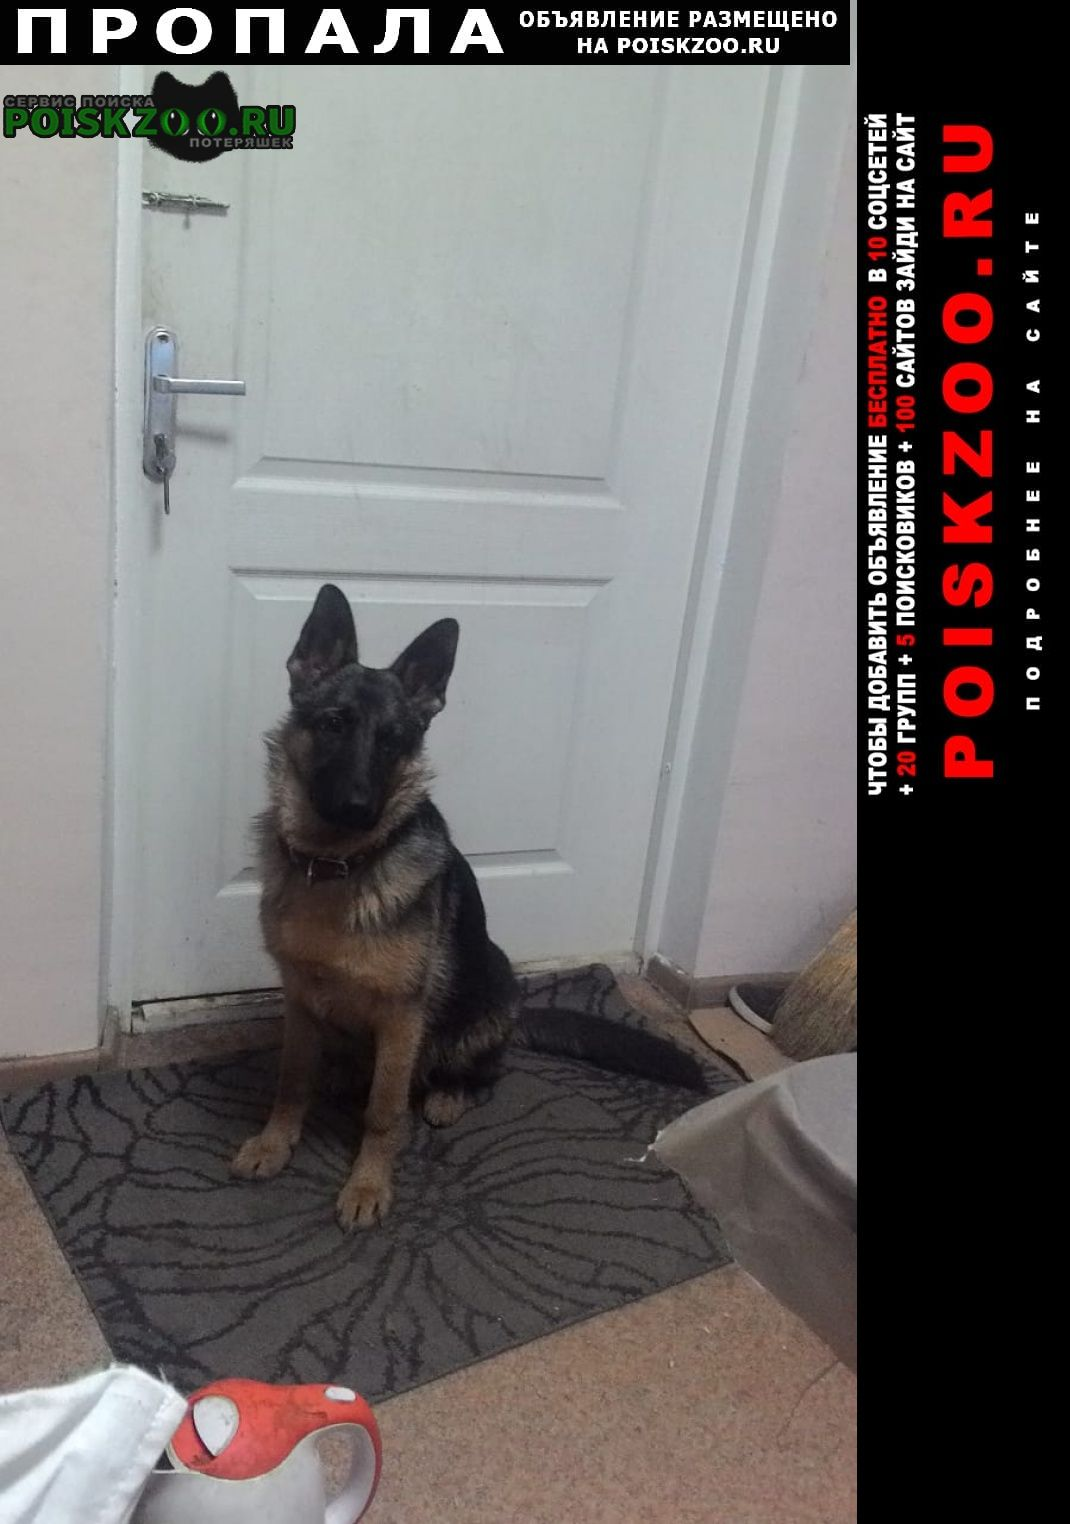 Пропала собака немецкая овчарка 7 месяцев Липецк